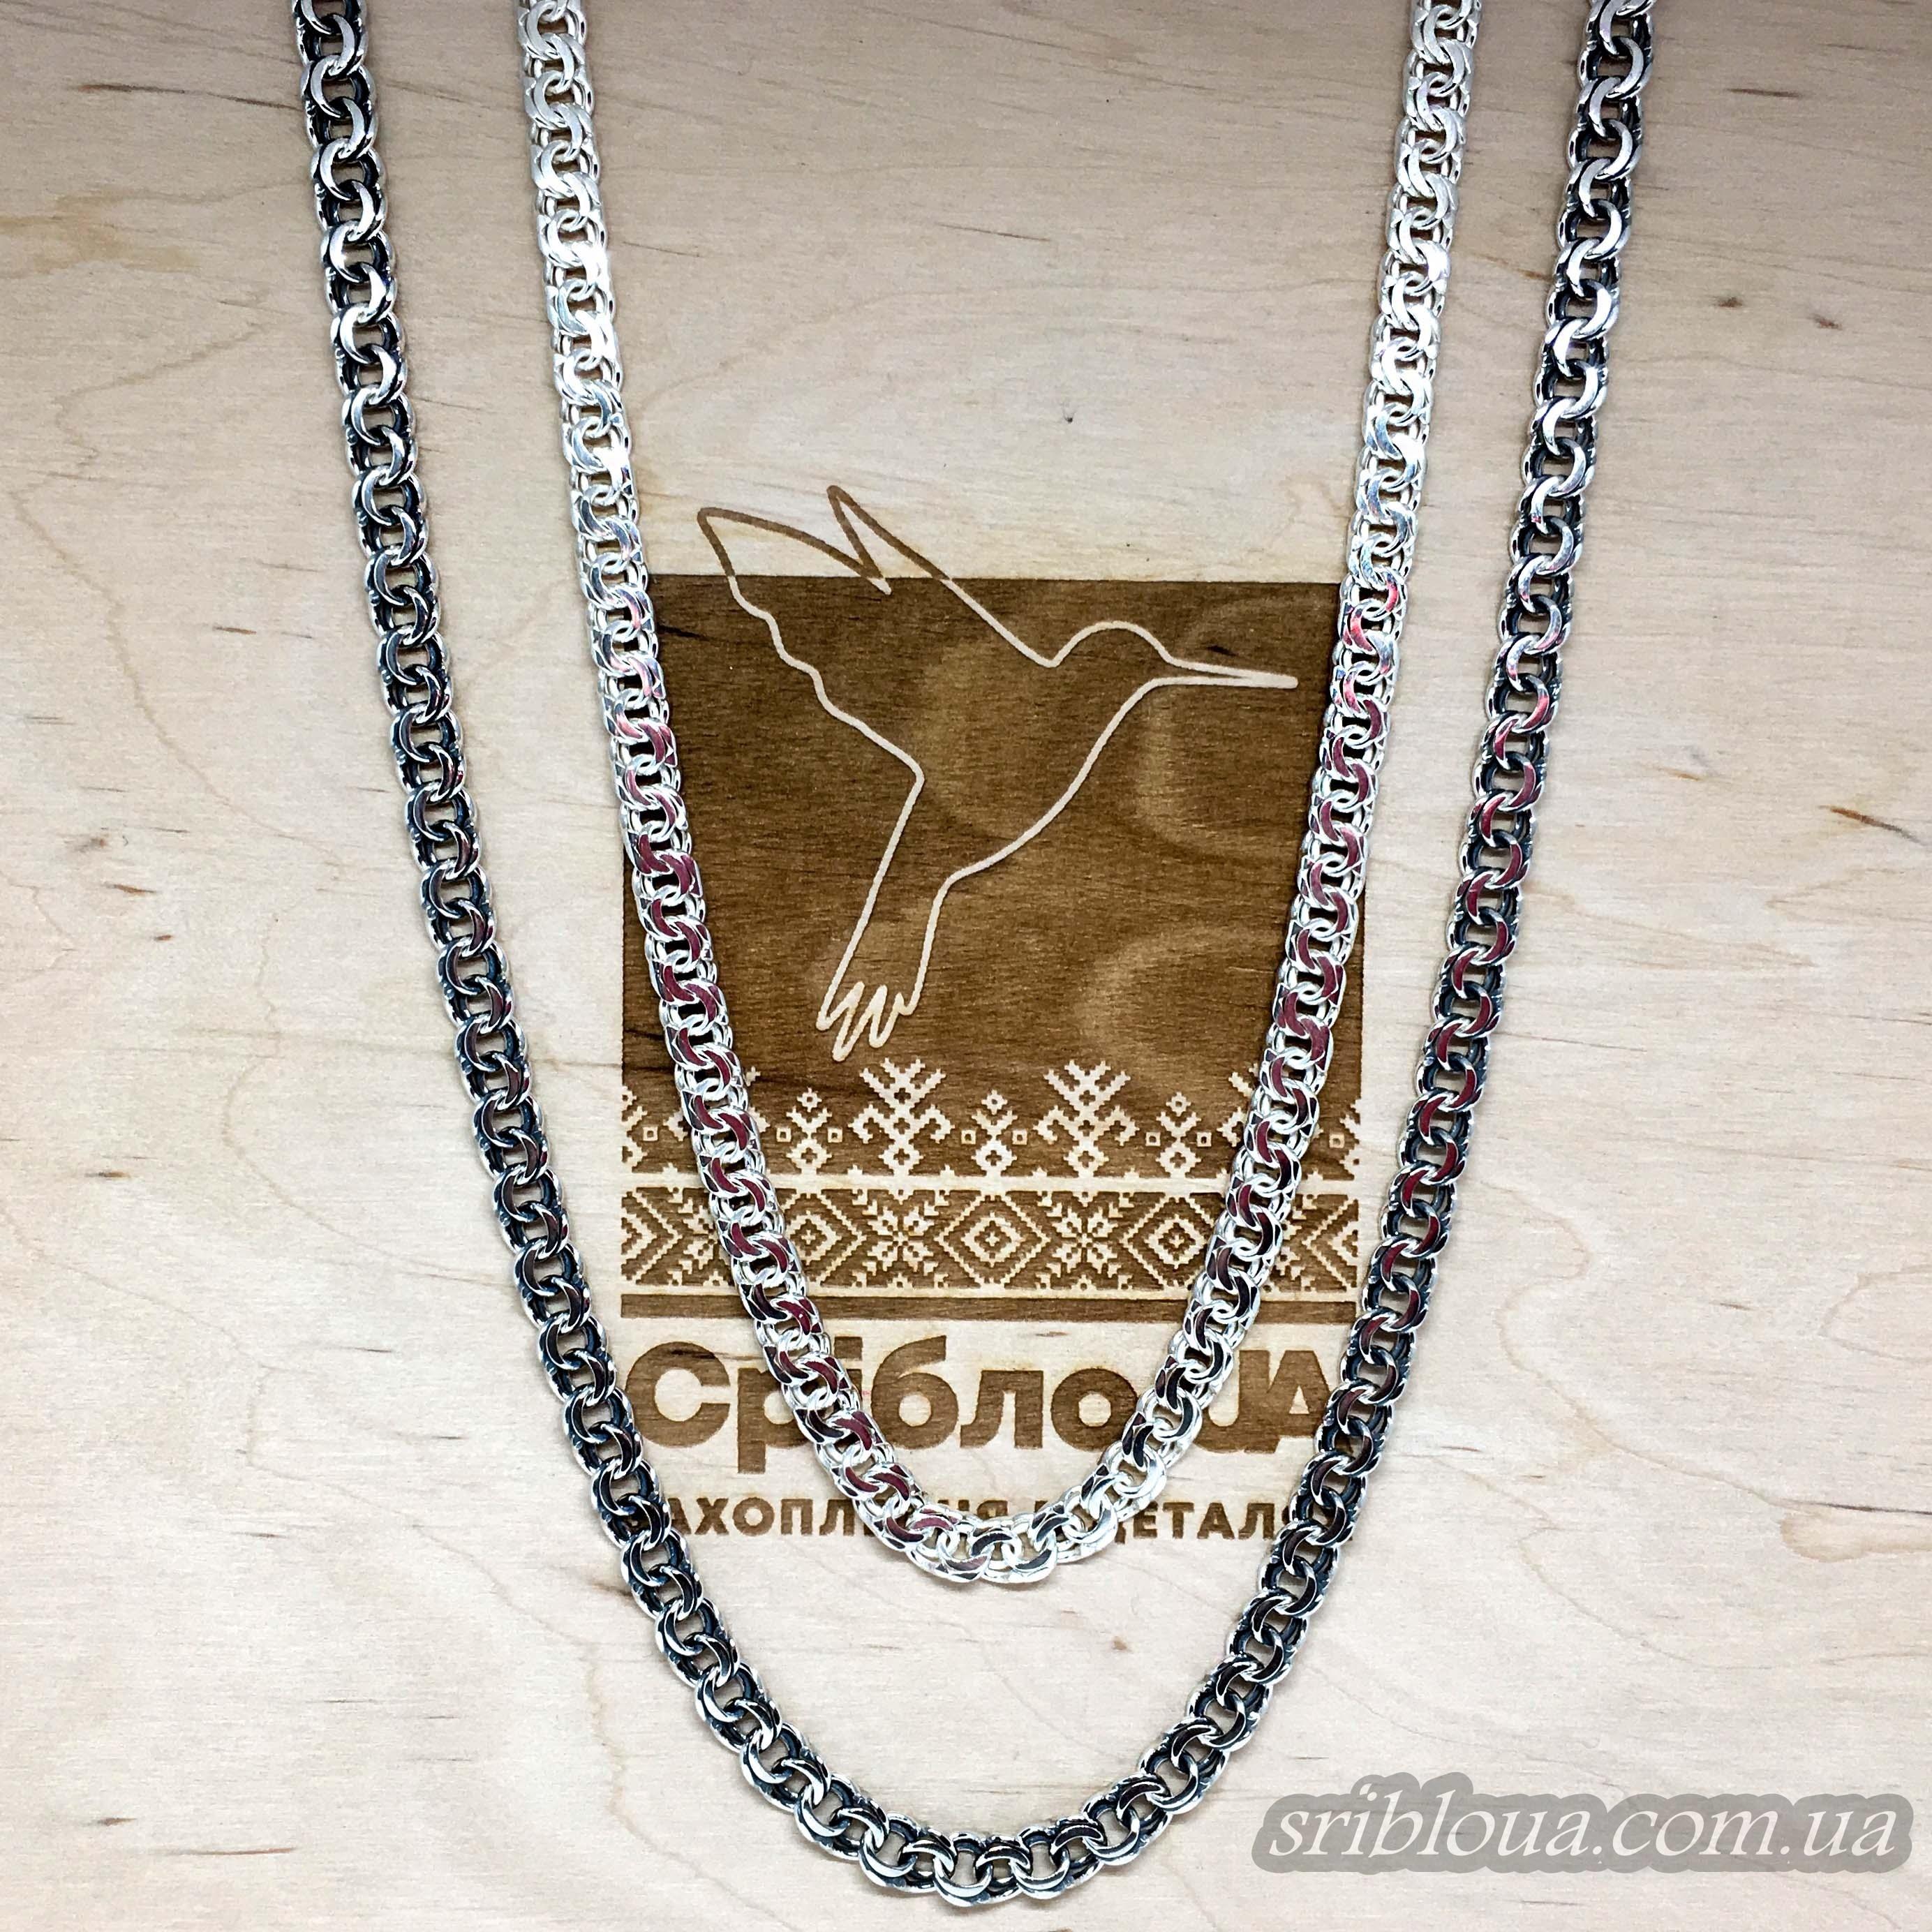 Серебряная мужская цепочка, плоский бисмарк (арт. 6007/26 бел)